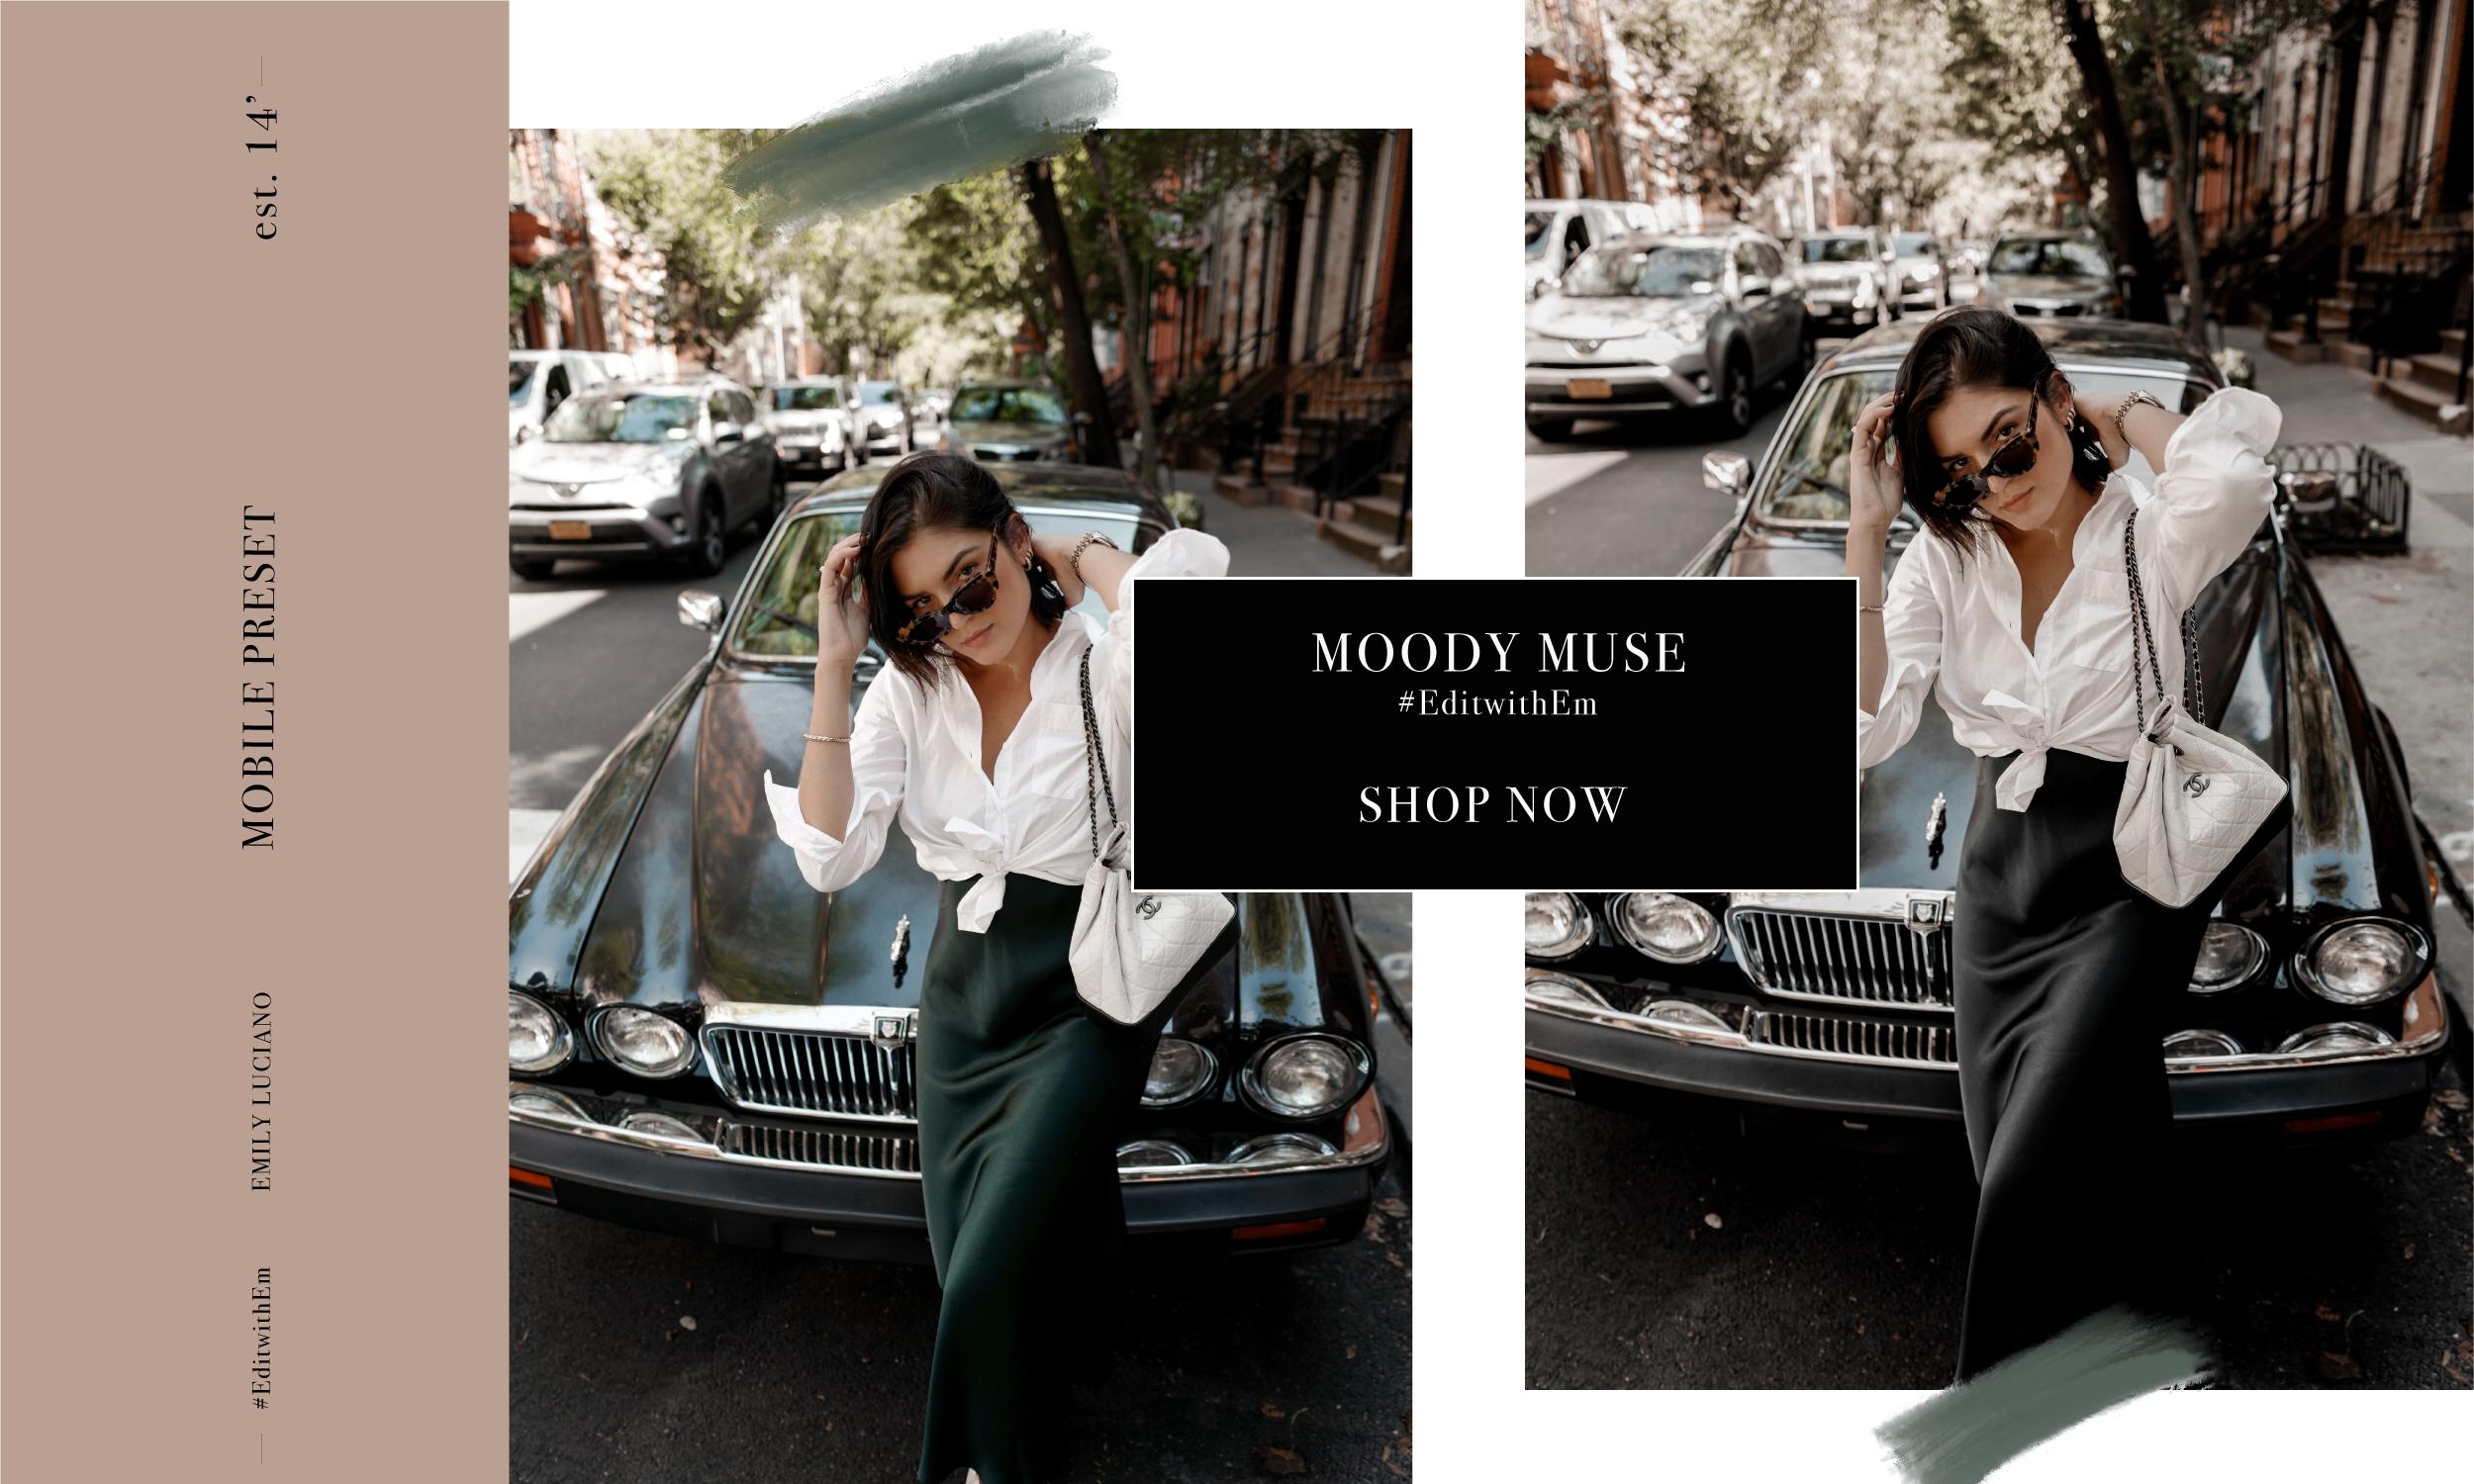 ShopNow_MoodyMuse_001.jpg